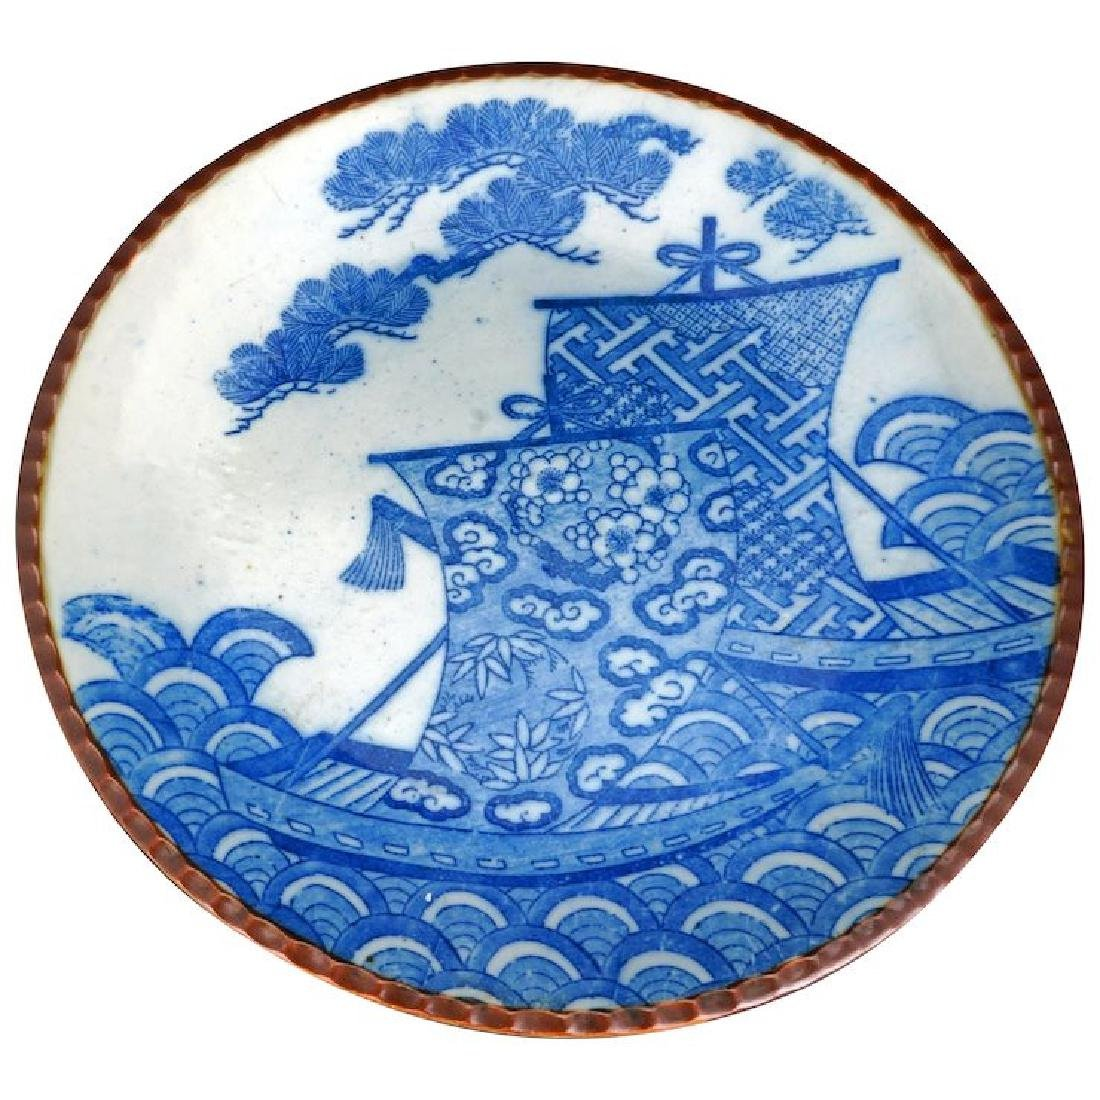 Japanese blue and white porcelain Igezara 12†charger